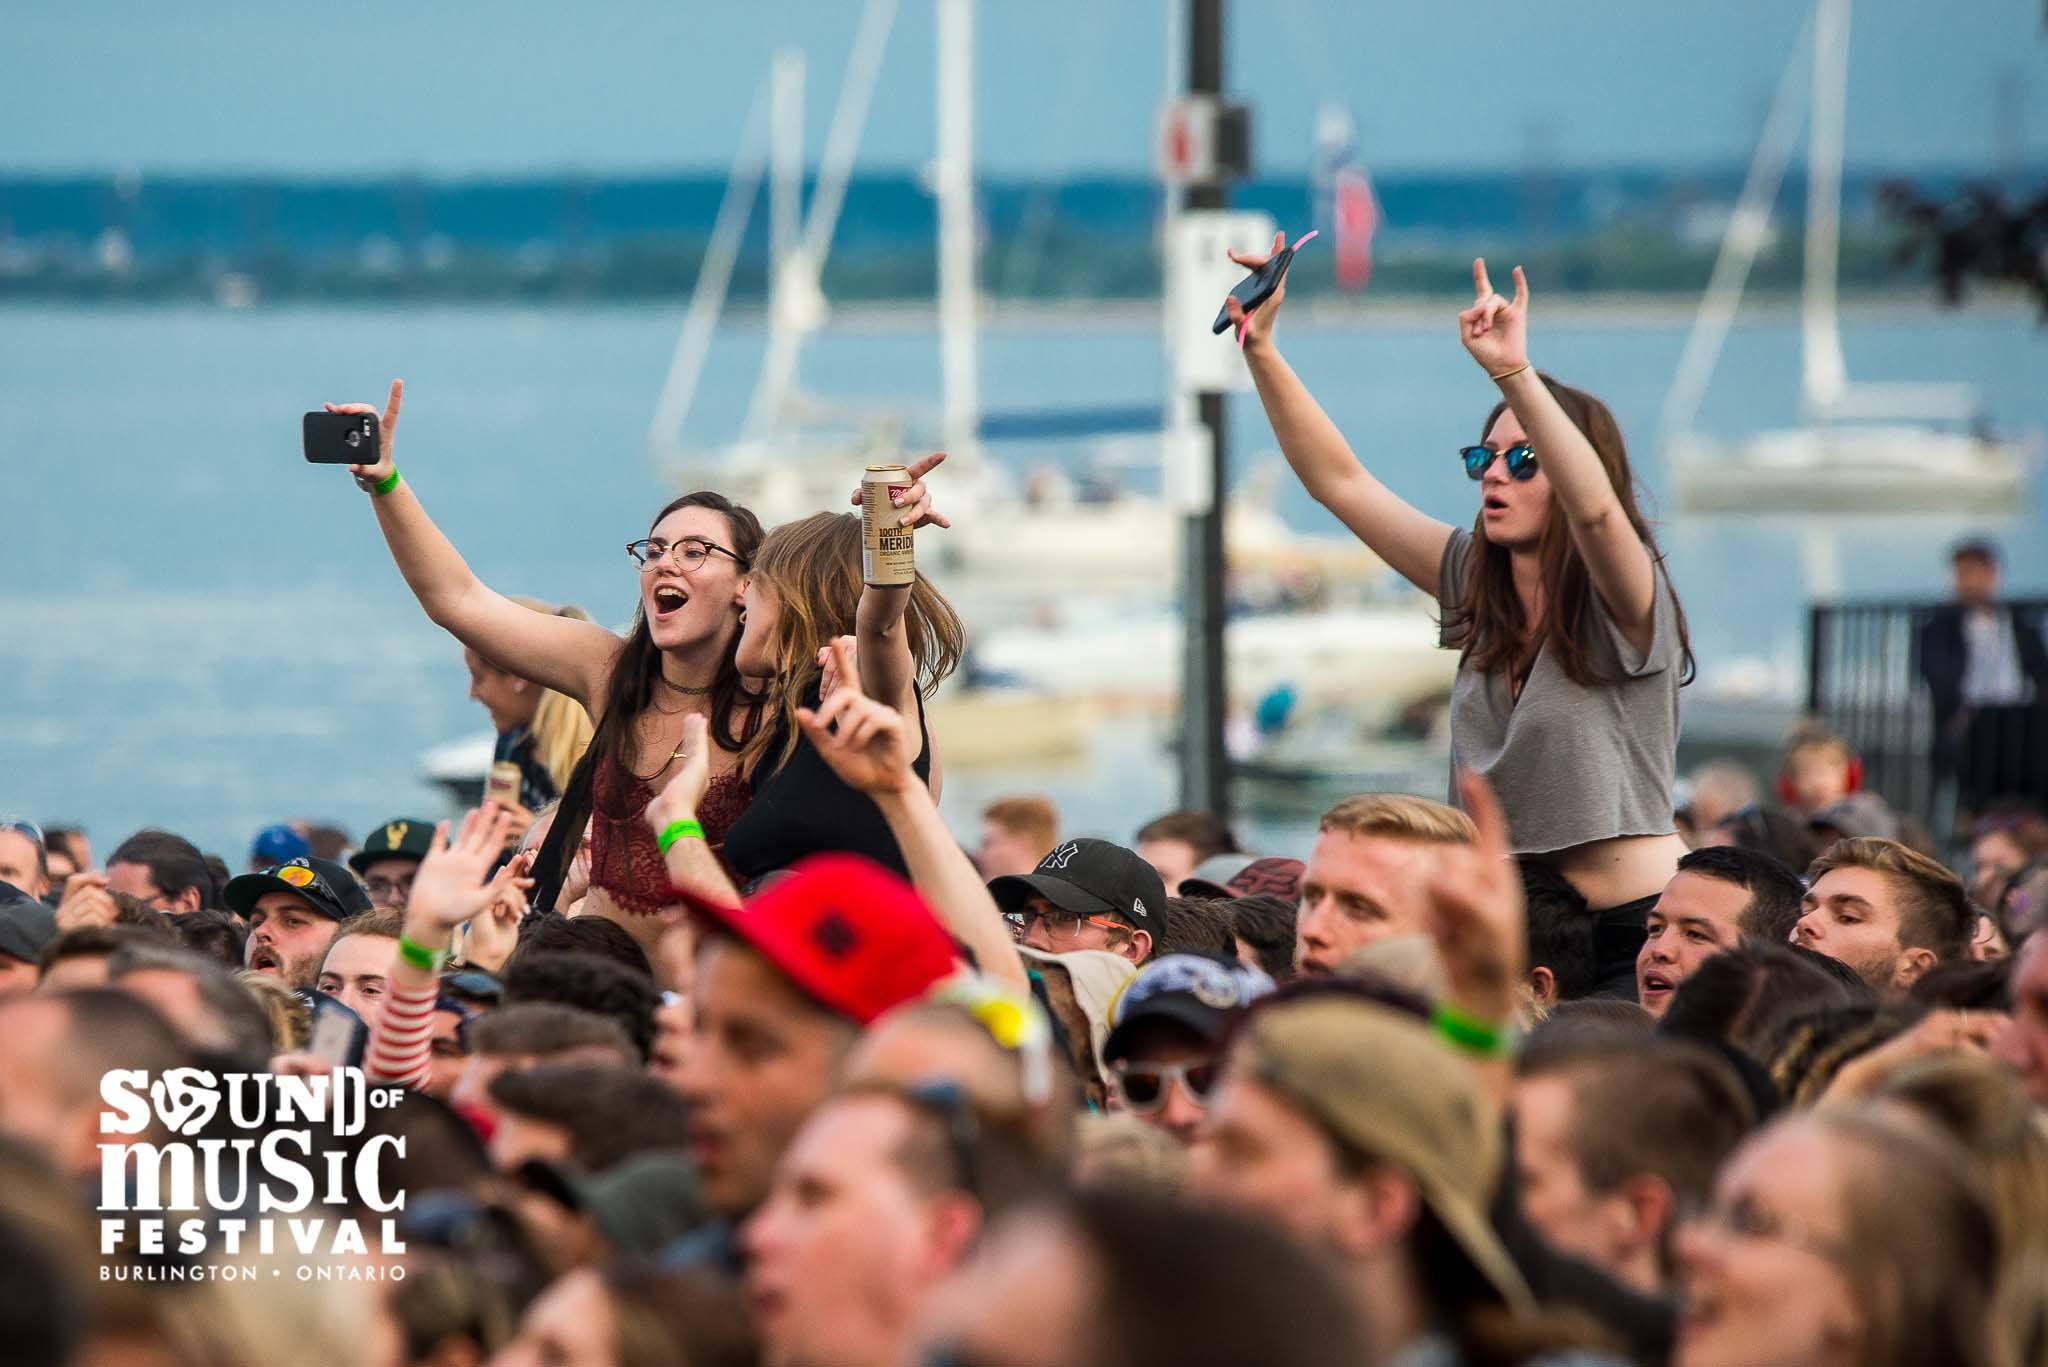 Crowd at Burlington Sound of Music Festival Concert